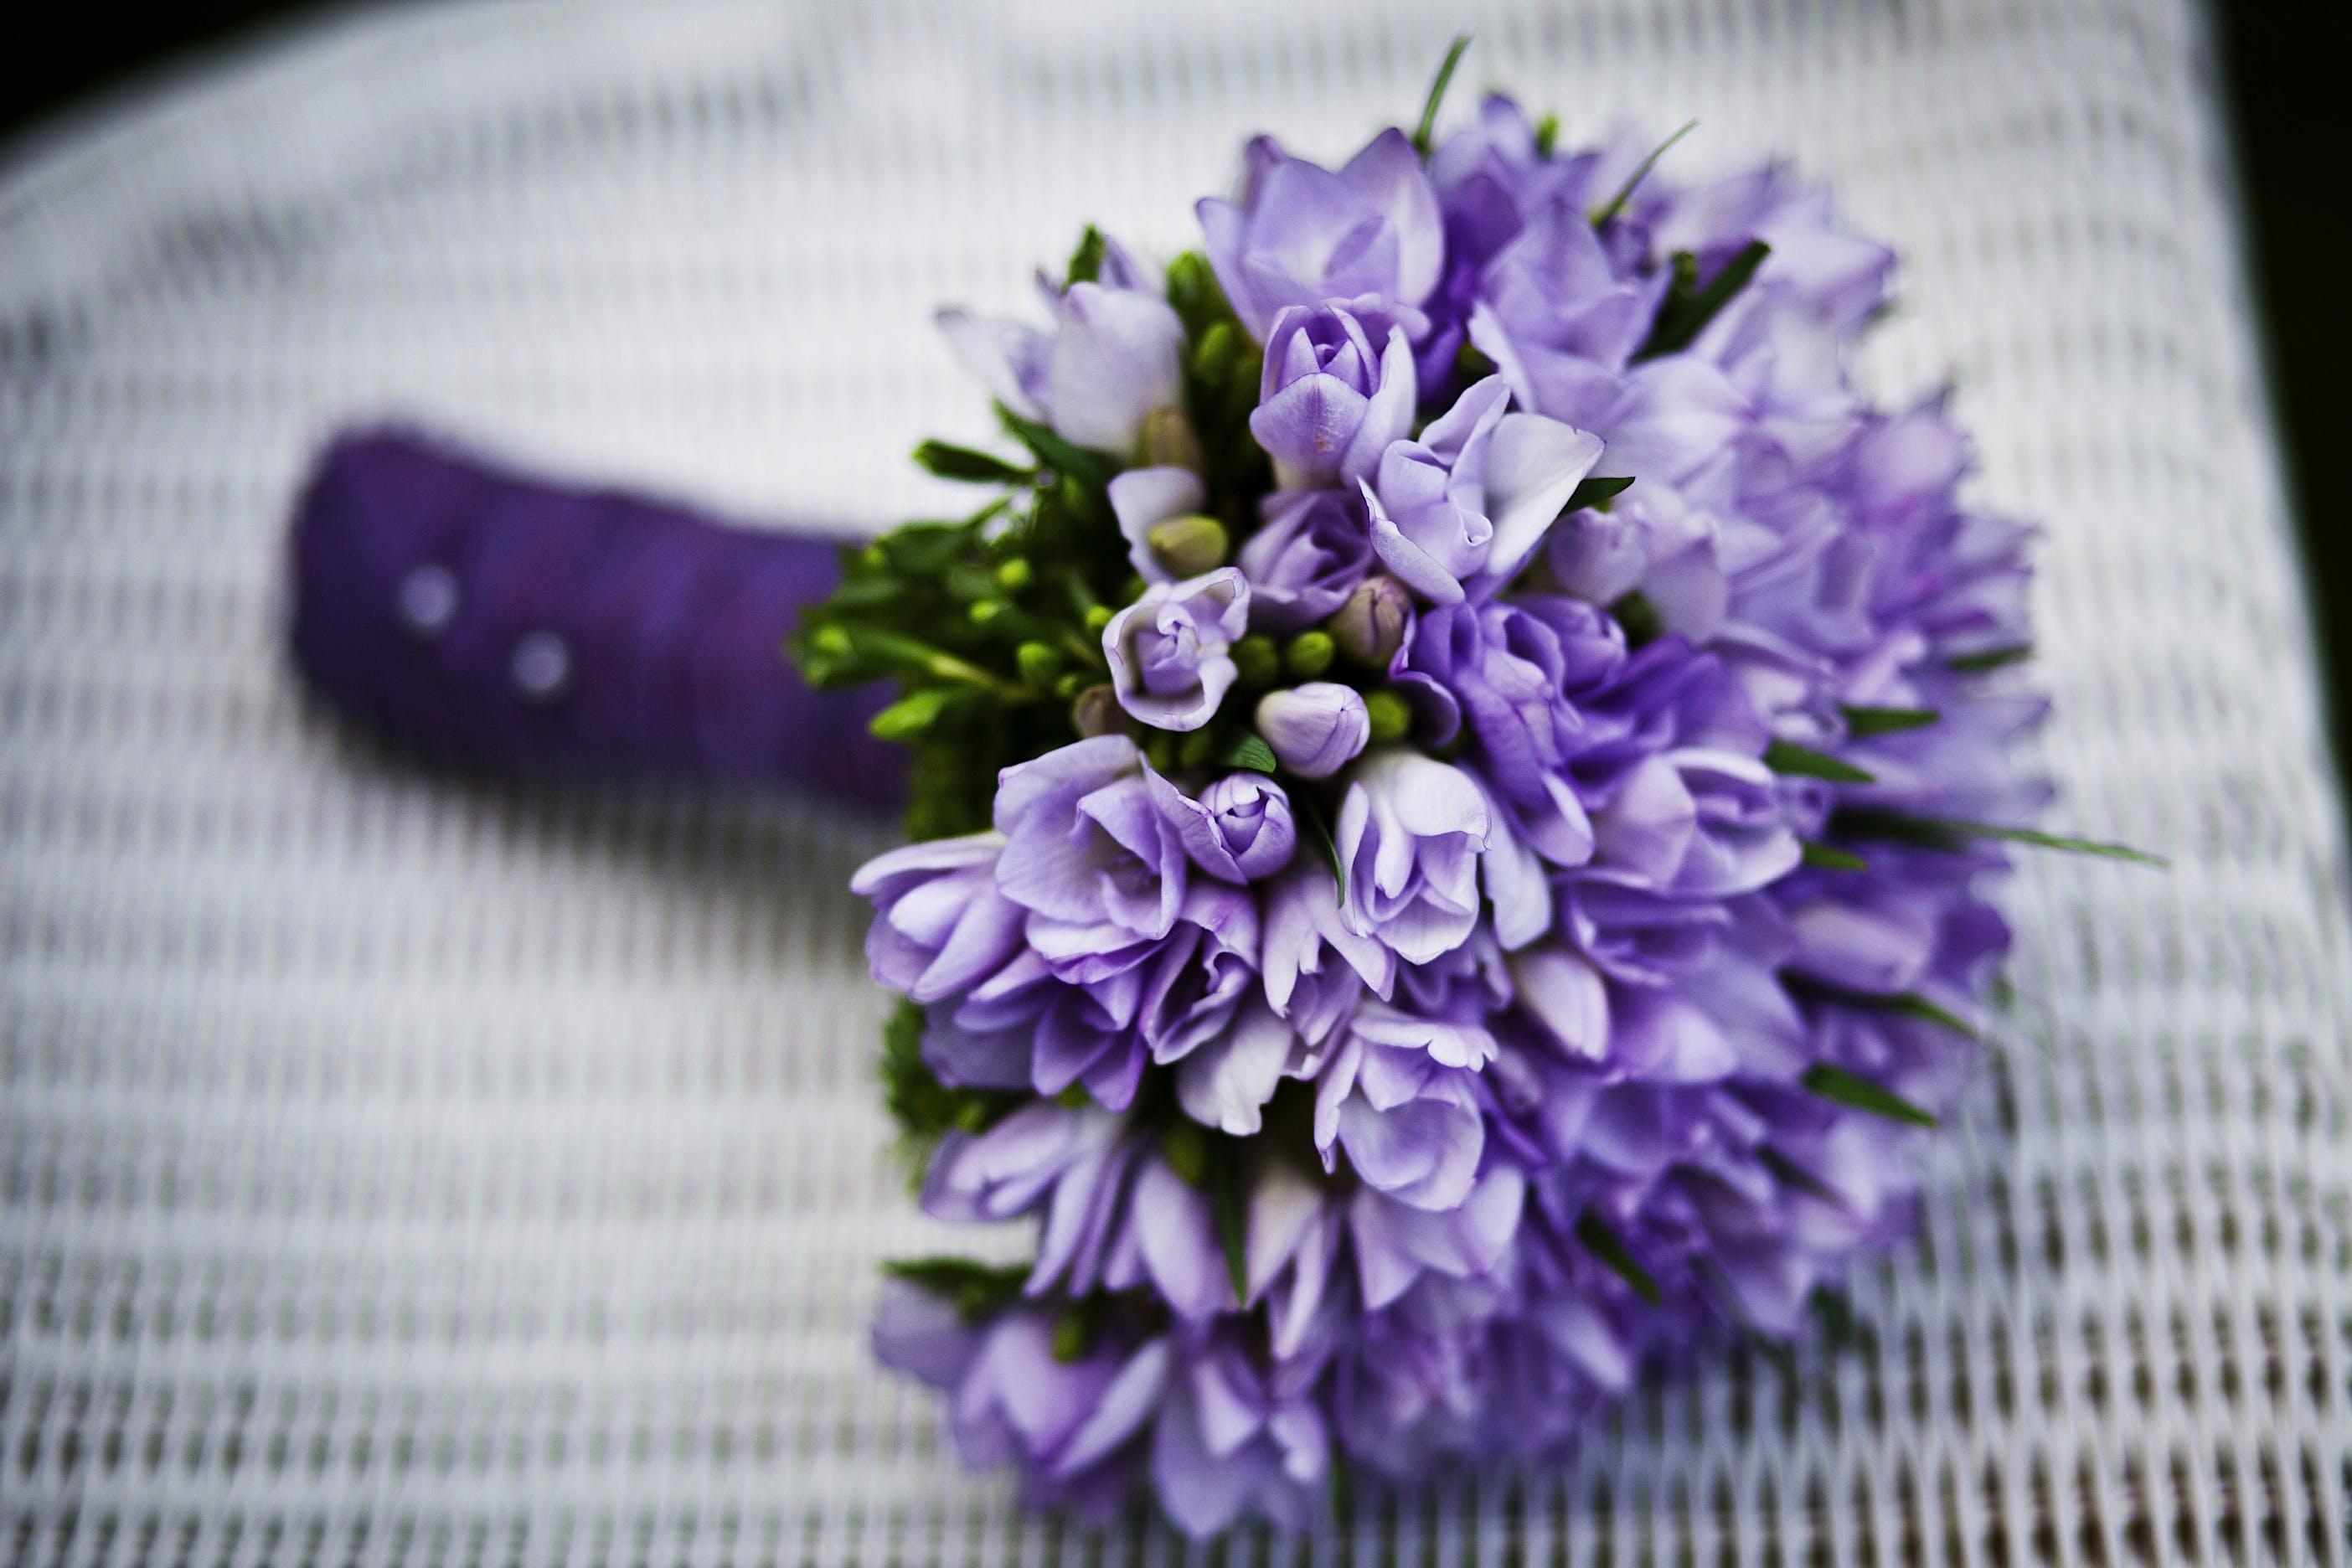 Purple Flower Bouquet on White Woven Chair